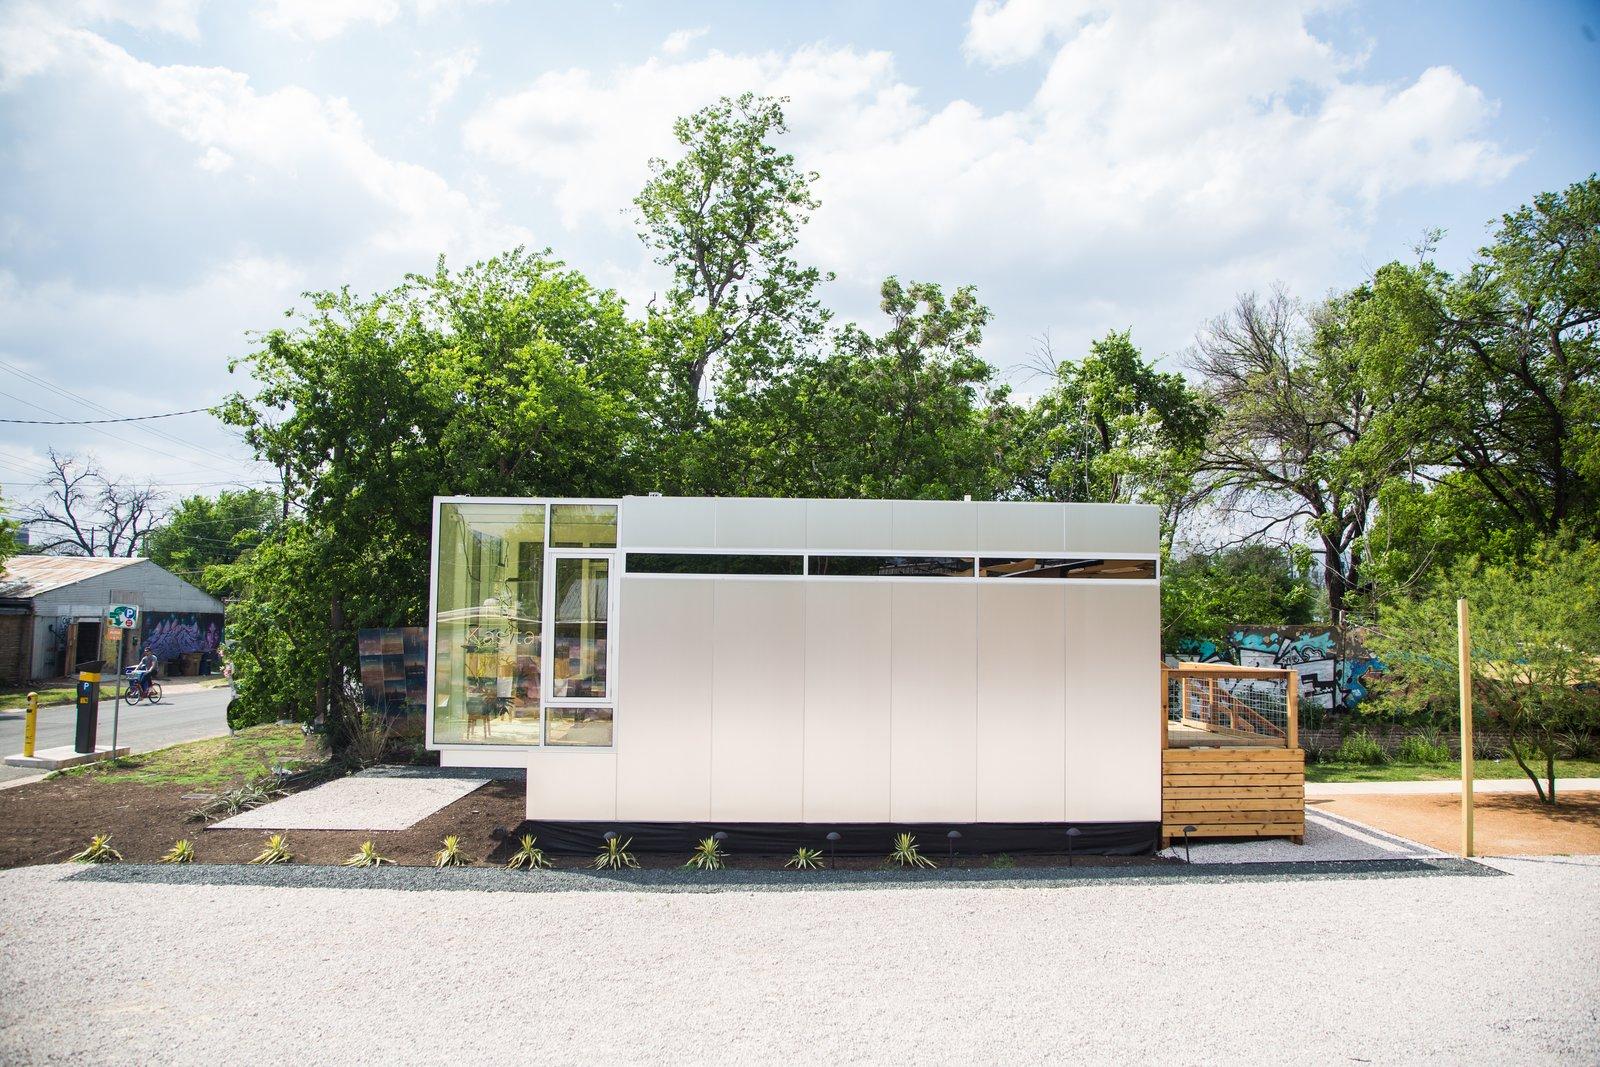 Kasita prefab tiny house